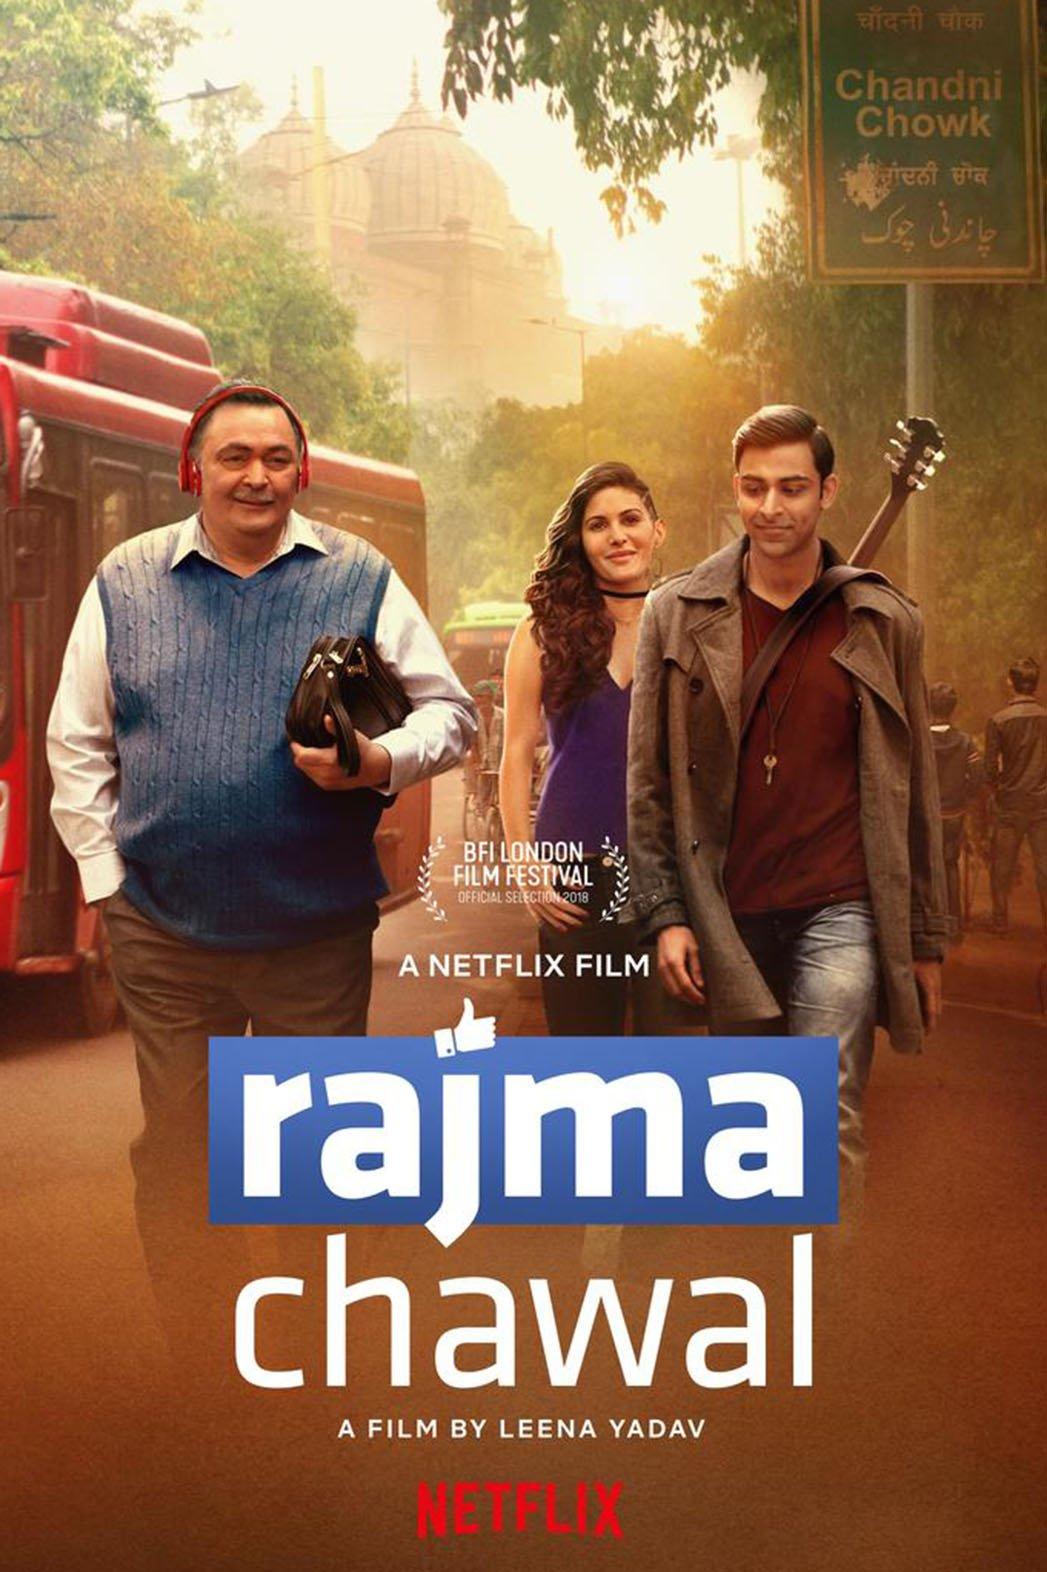 Rajma Chawal (2018) เมื่อพ่อขอเป็นเพื่อน